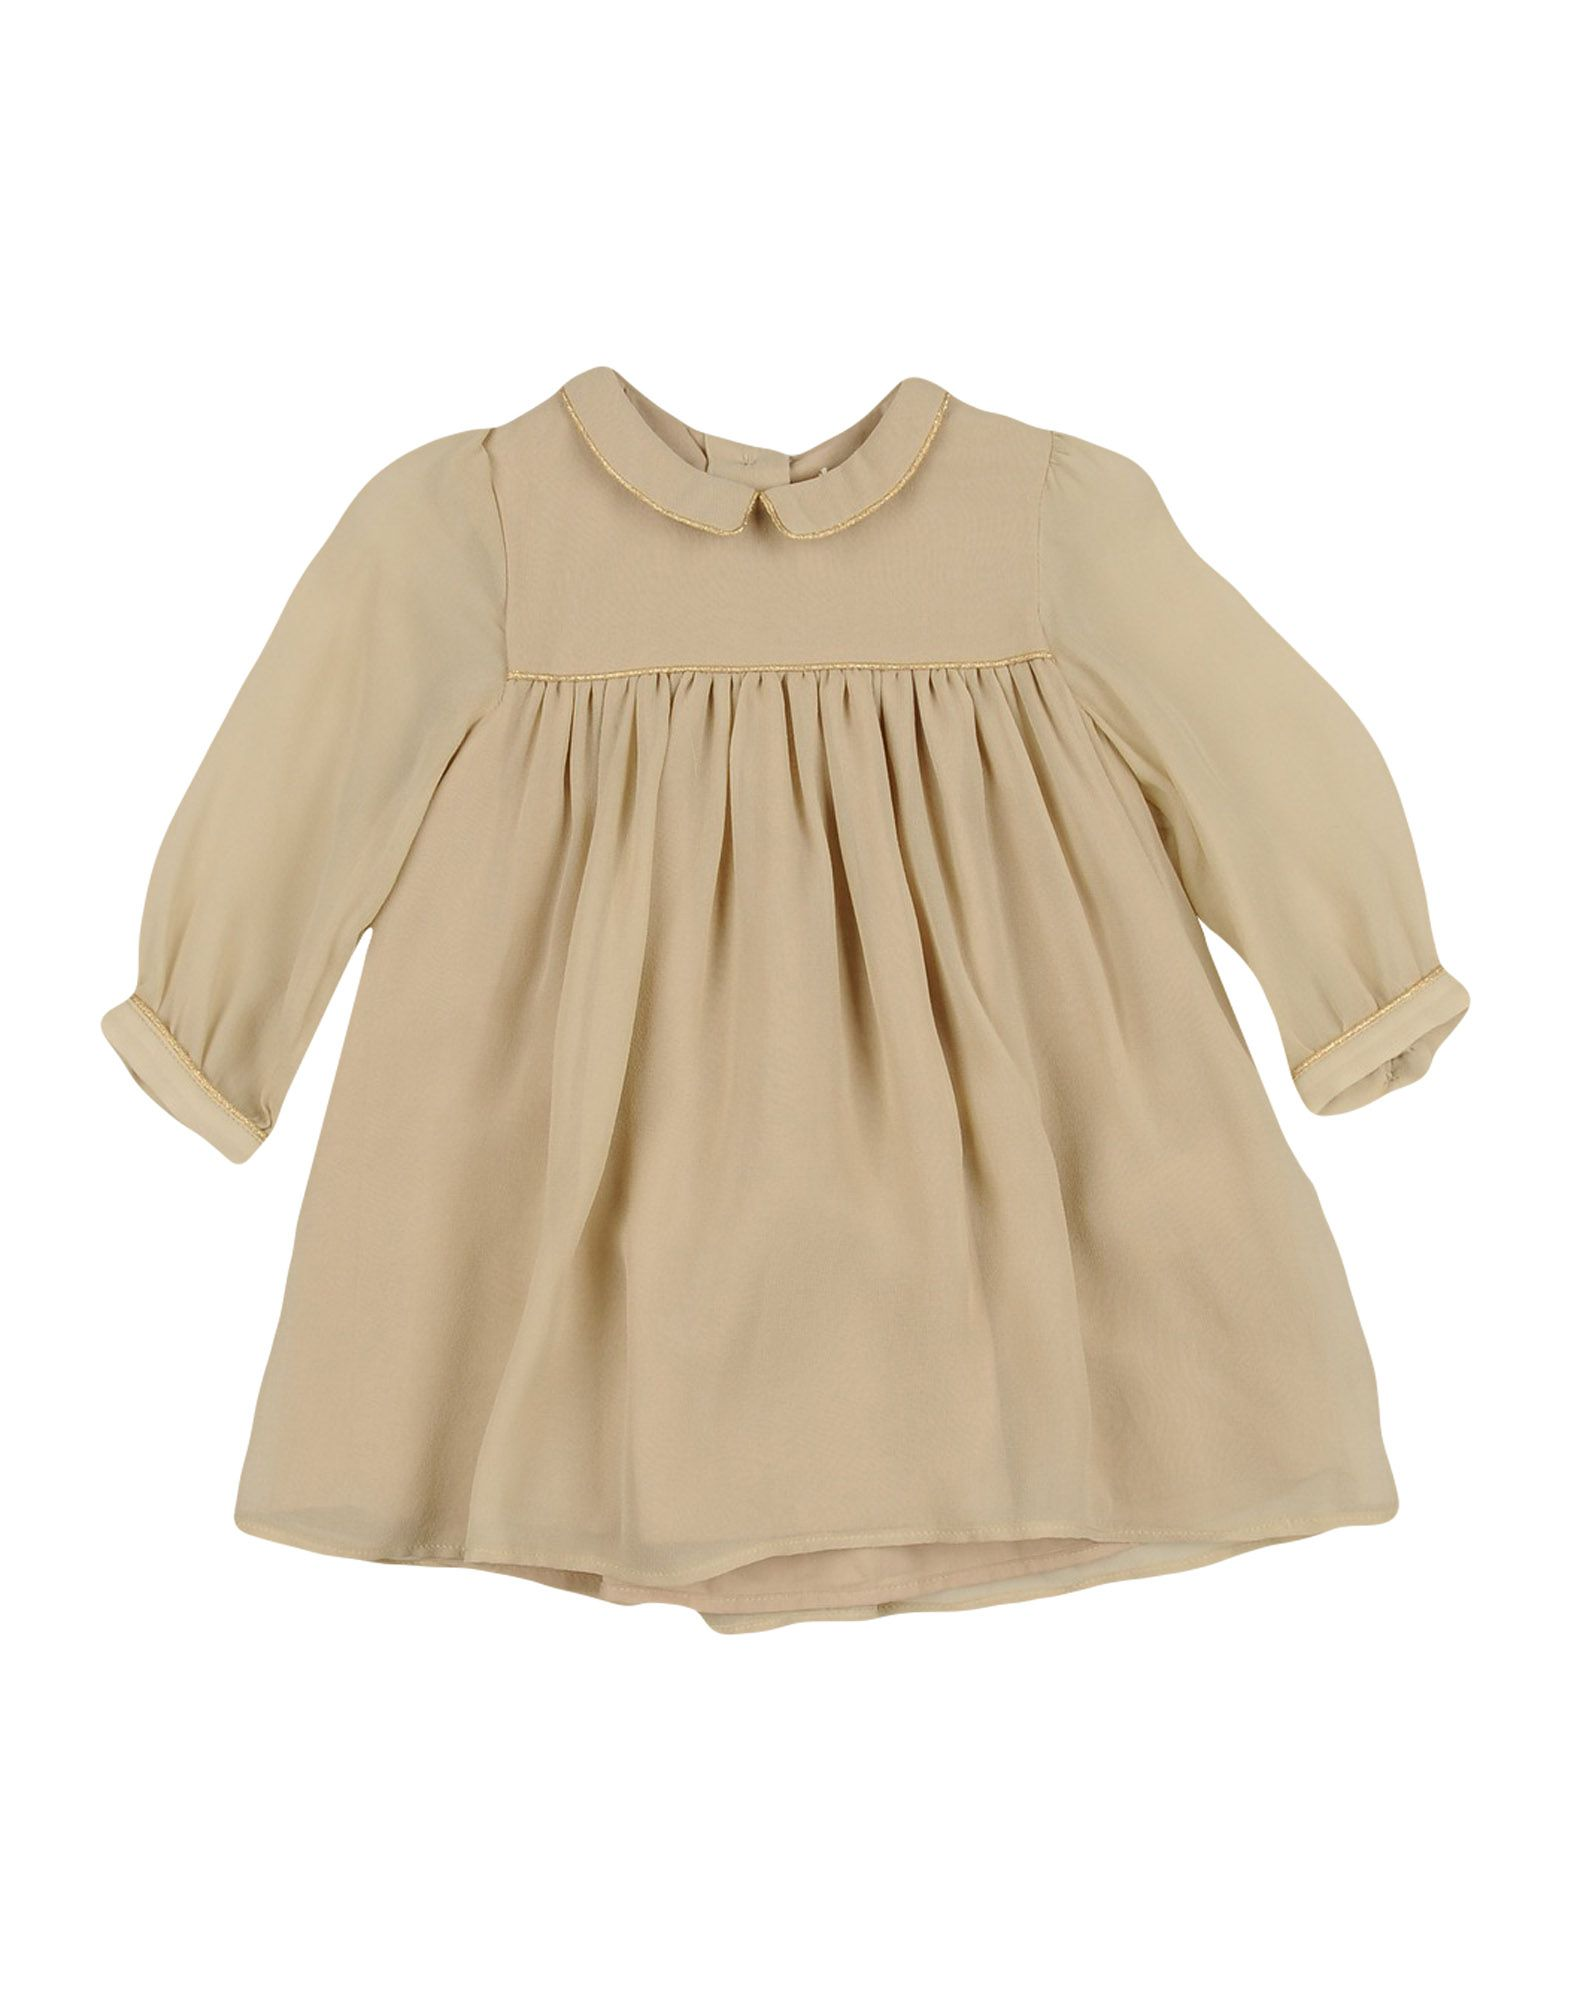 MARIE CHANTAL Dresses